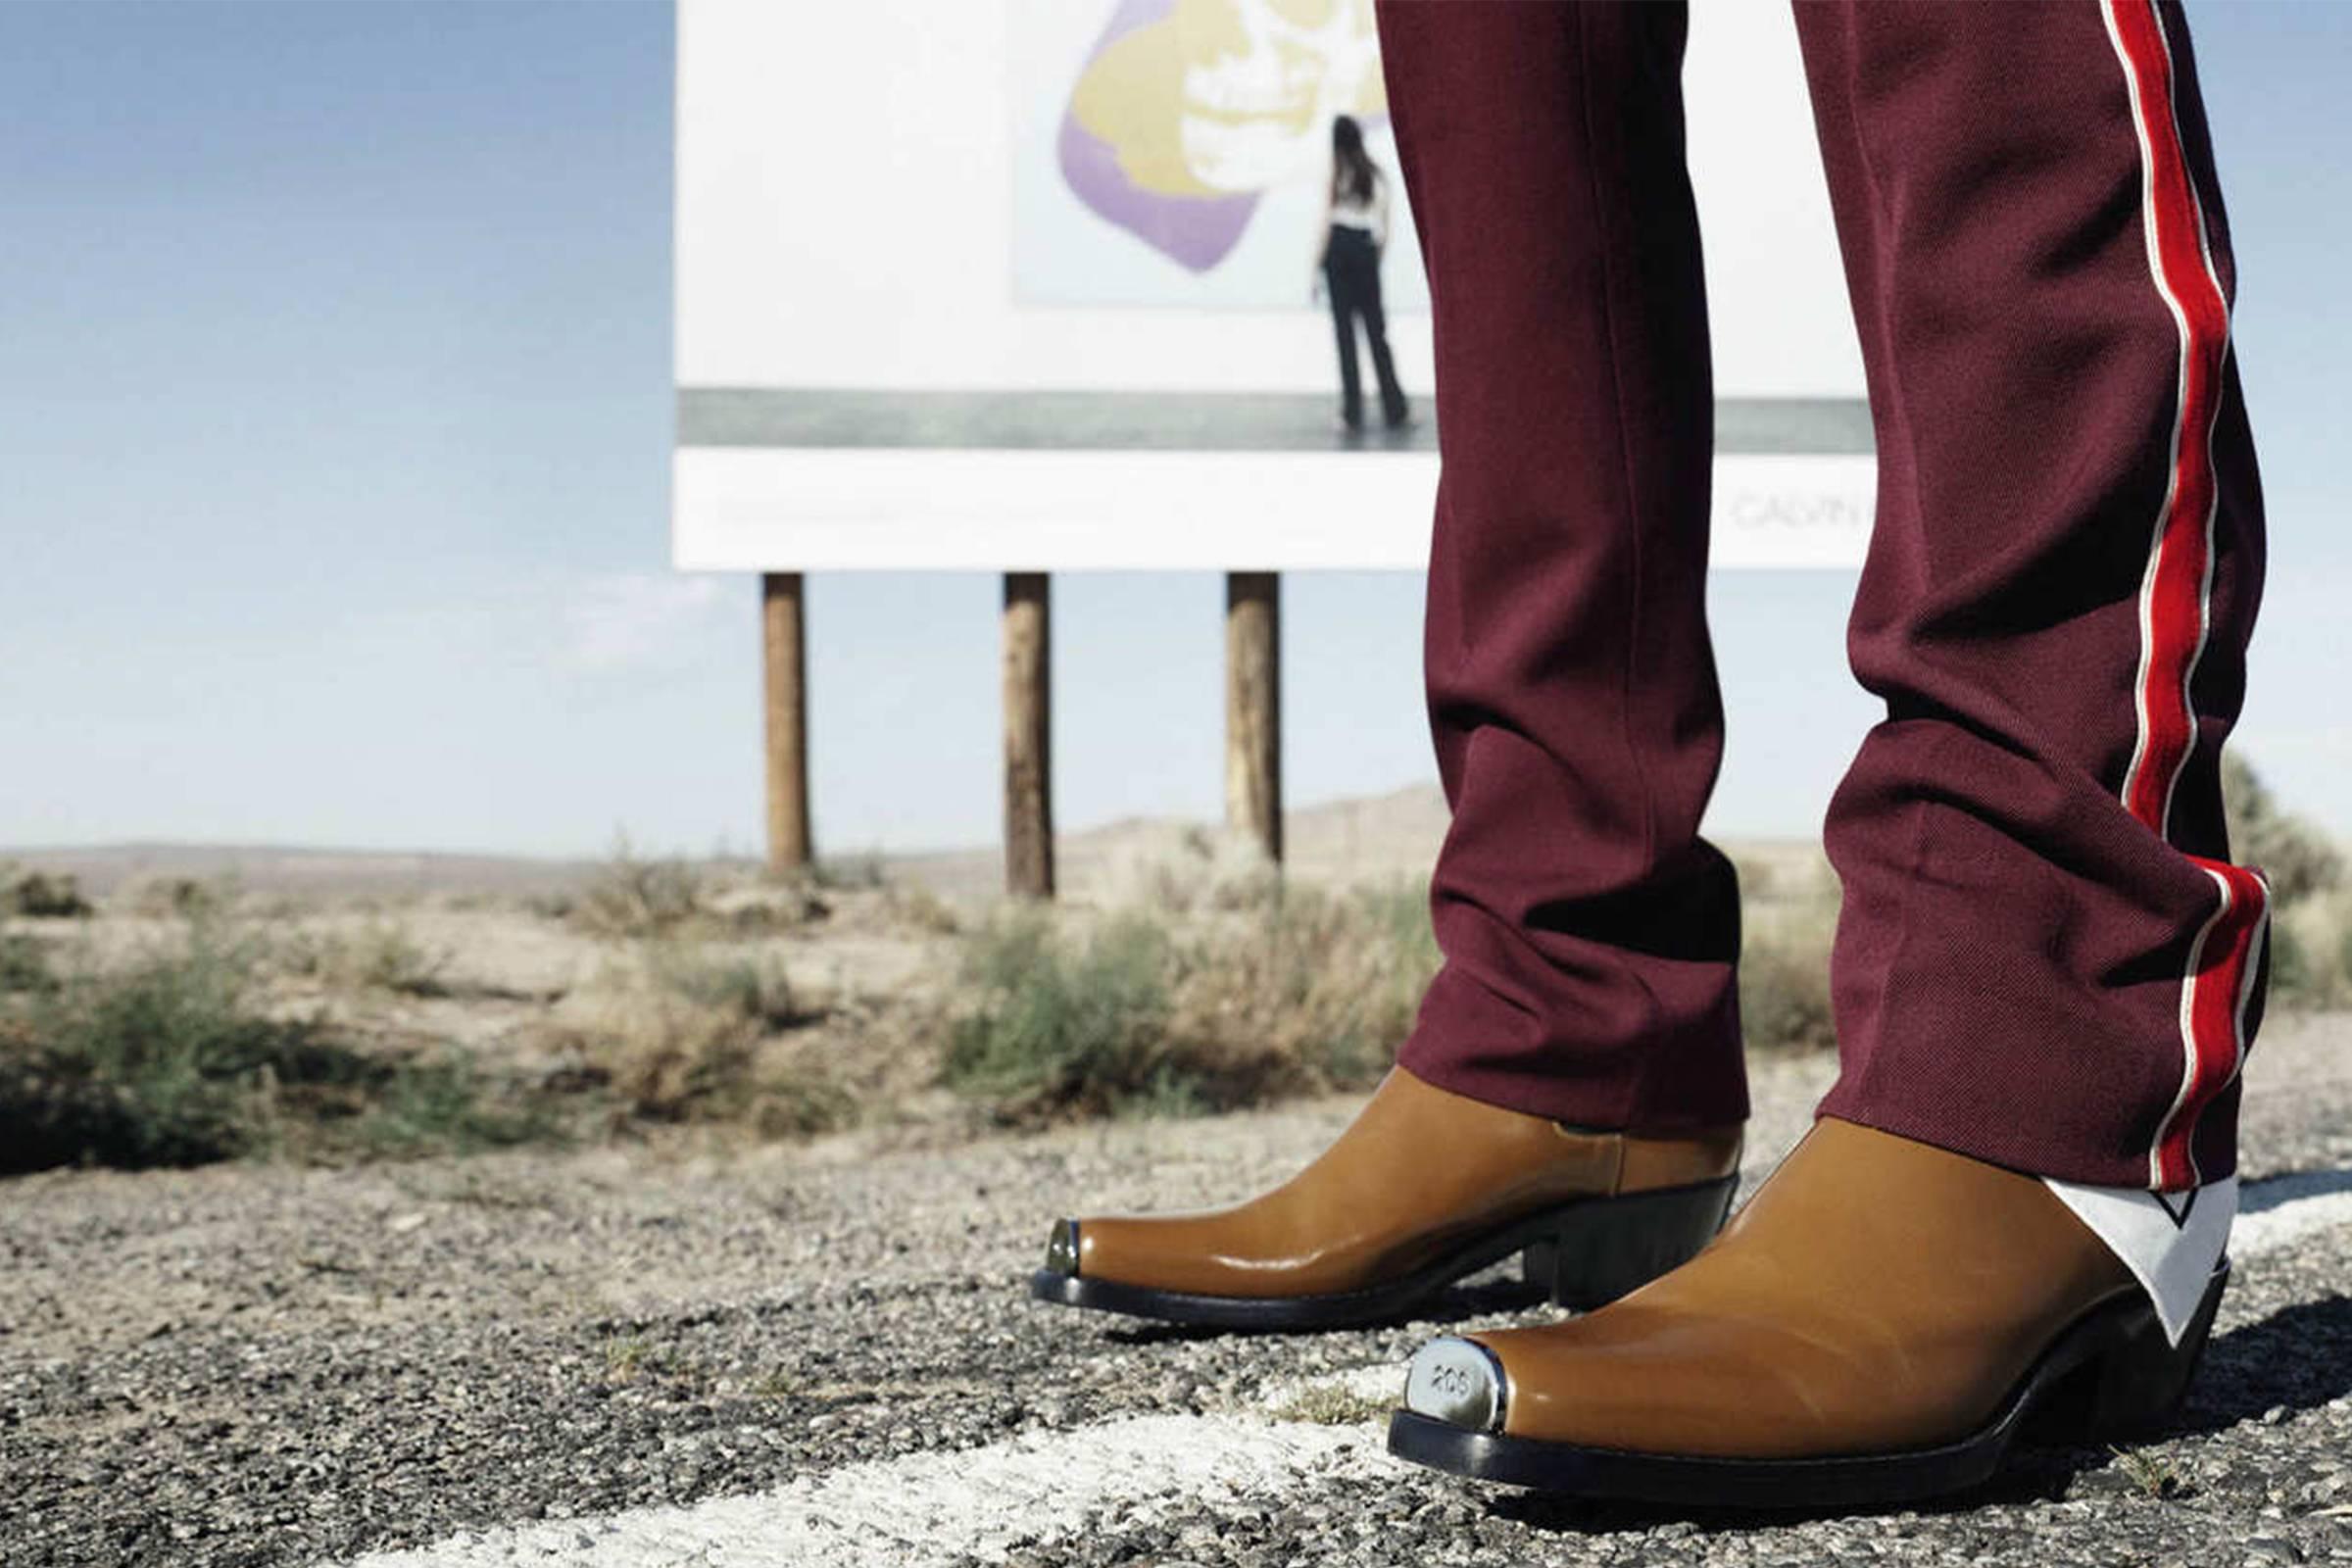 Heel To Toe The Sudden Resurgence of Cowboy Boots Resurgence